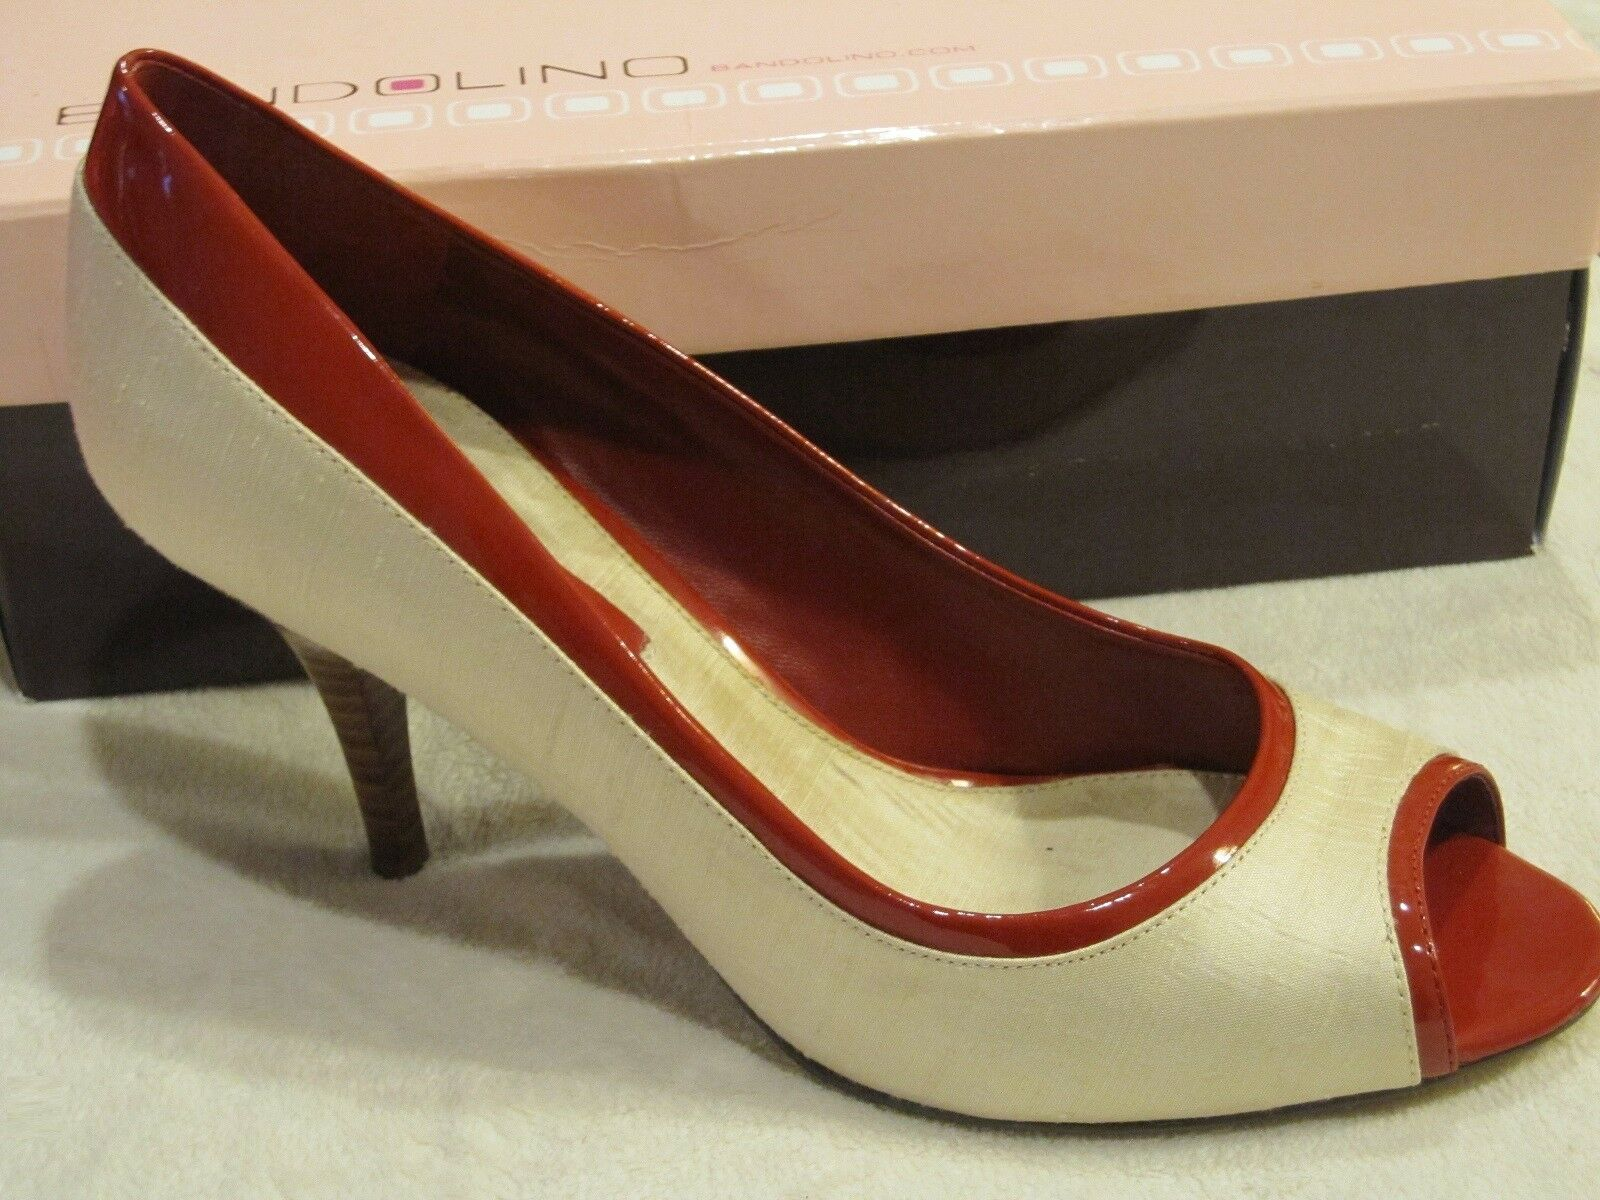 Bandolino GORDONA Ivory Silken Linen Open-toe Pump w/ROT Patent Trim, 8M - 99